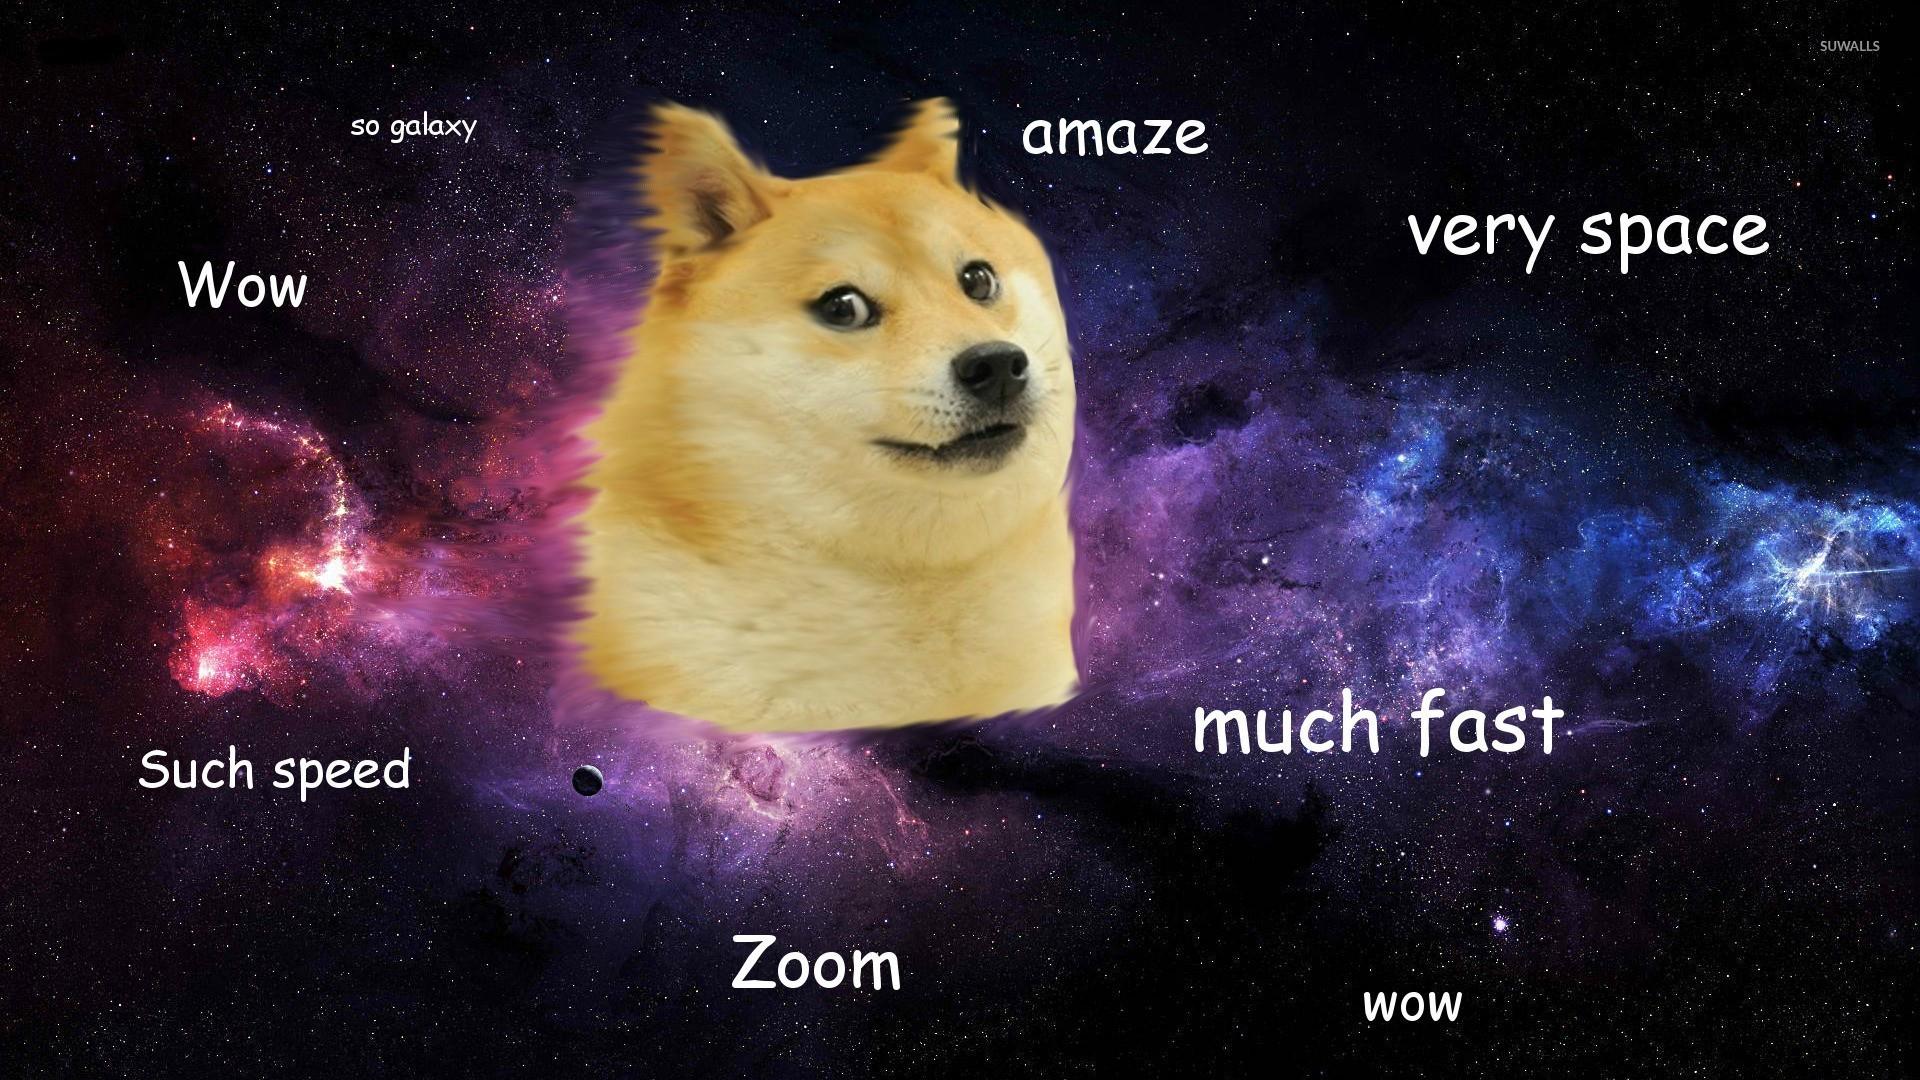 Doge [3] Wallpaper - Doge Meme Space , HD Wallpaper & Backgrounds